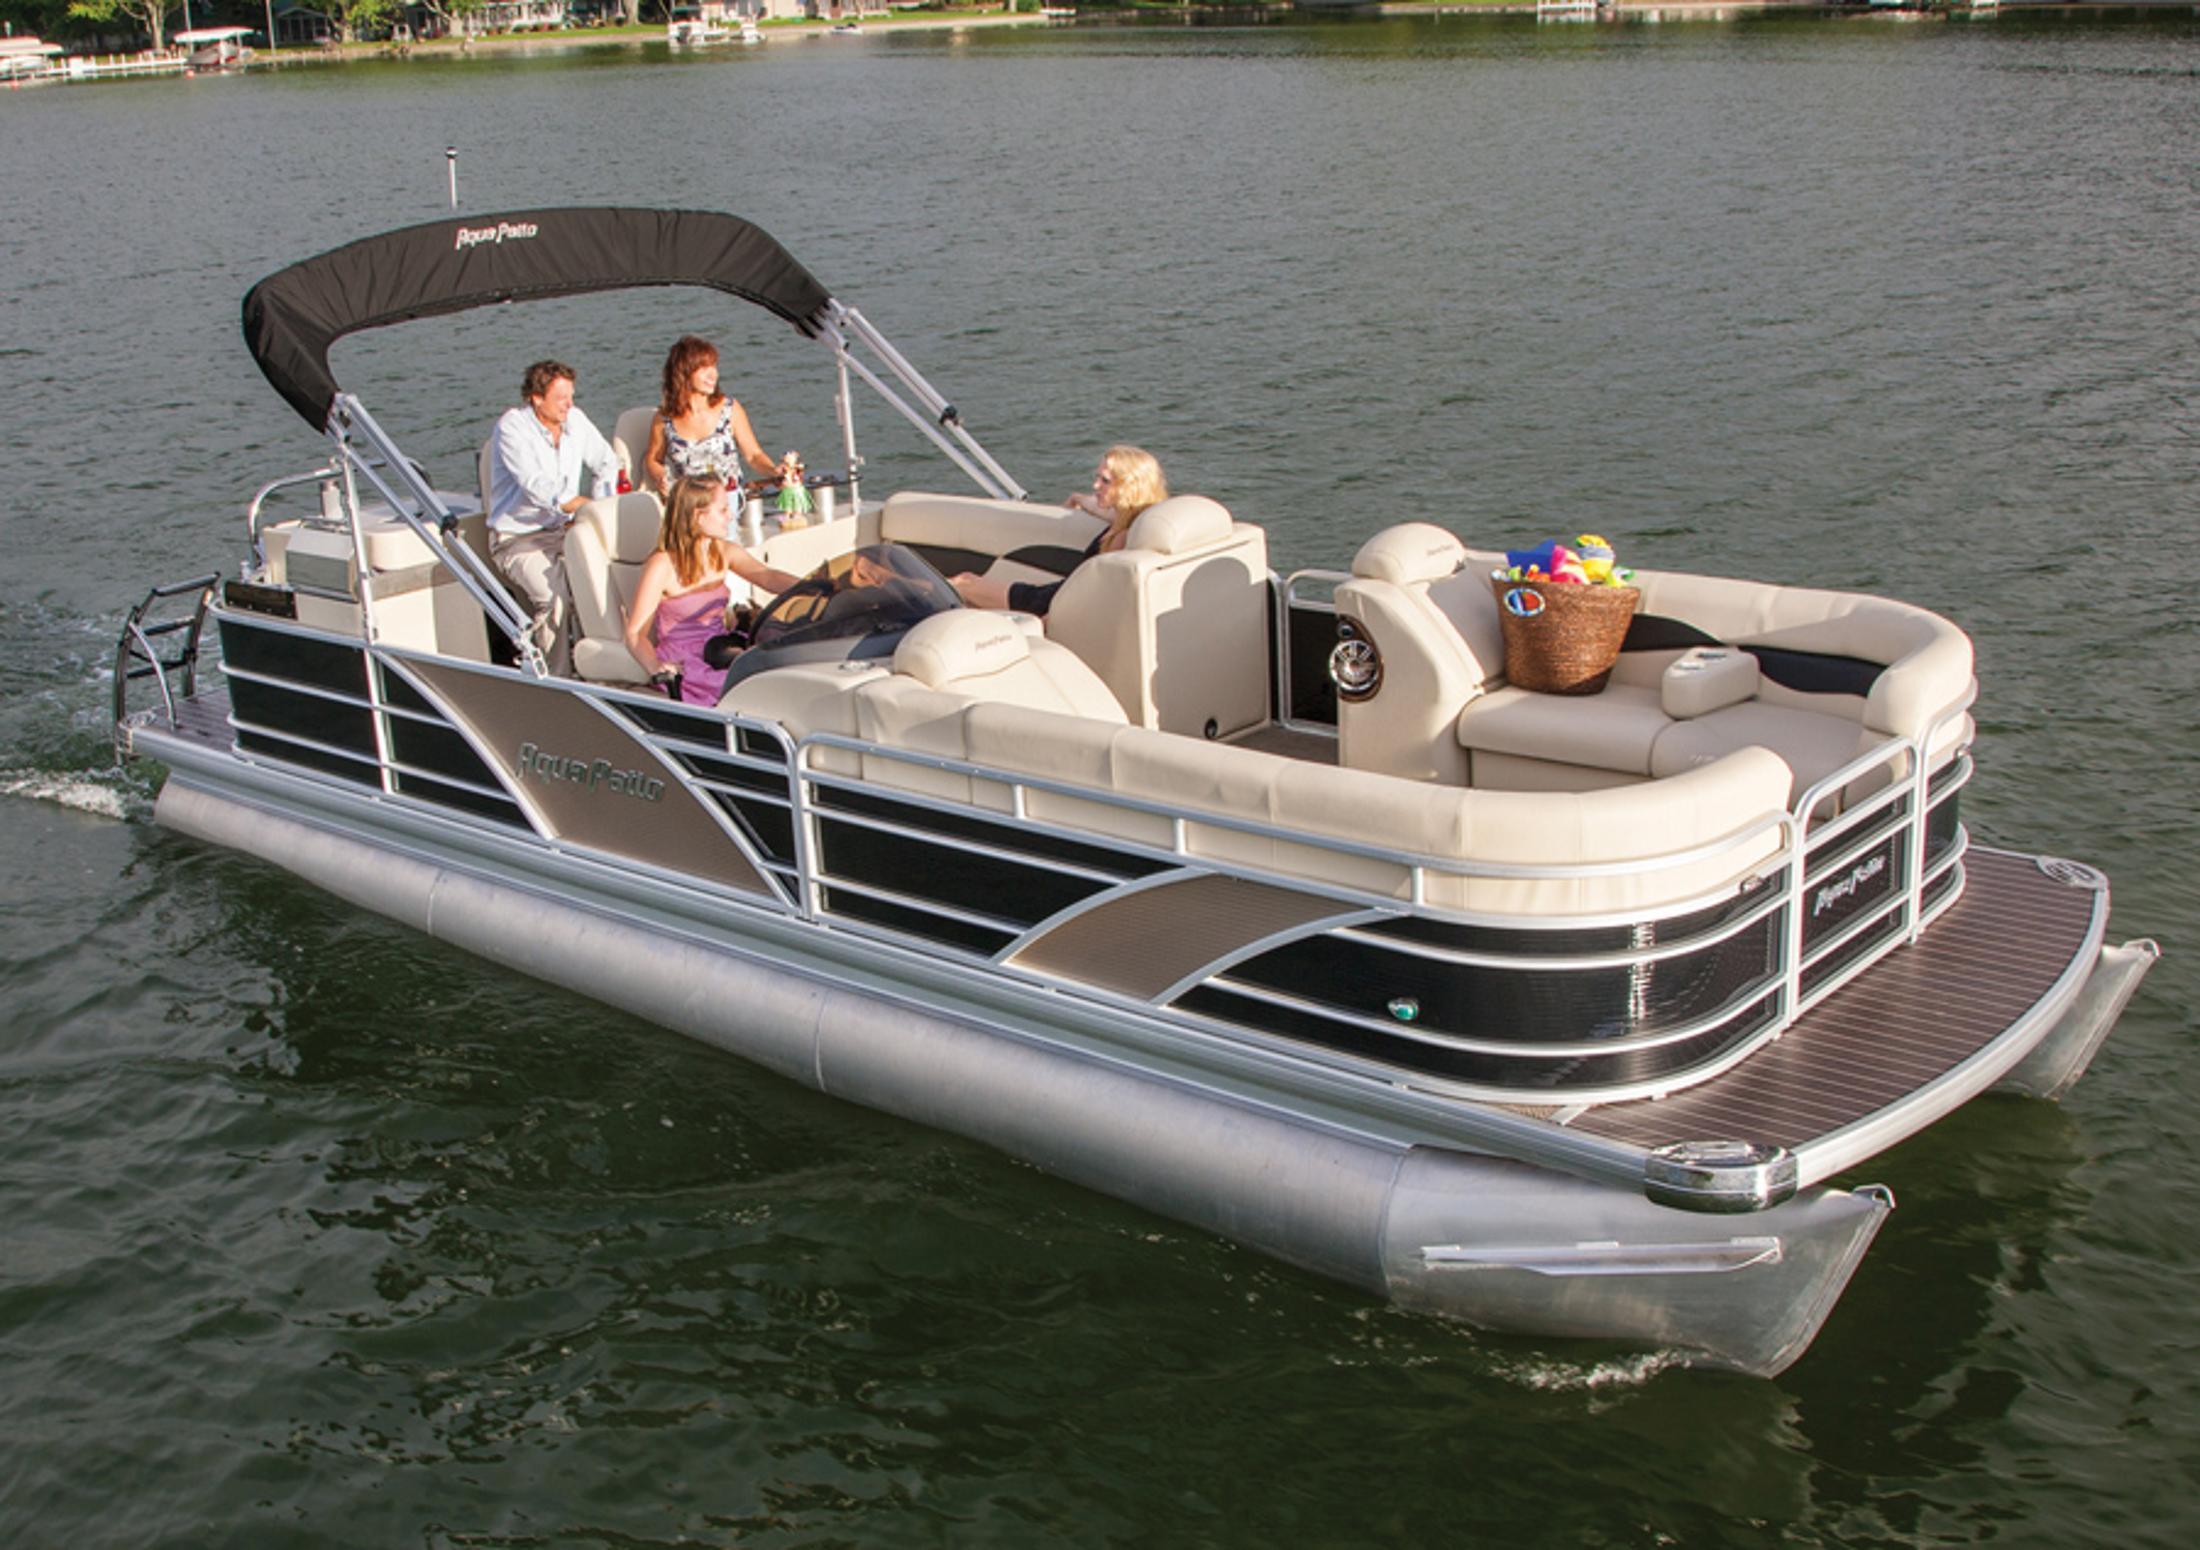 2013 Aqua Patio 250 WB Power Boats Inboard Niceville Florida 250WB2013